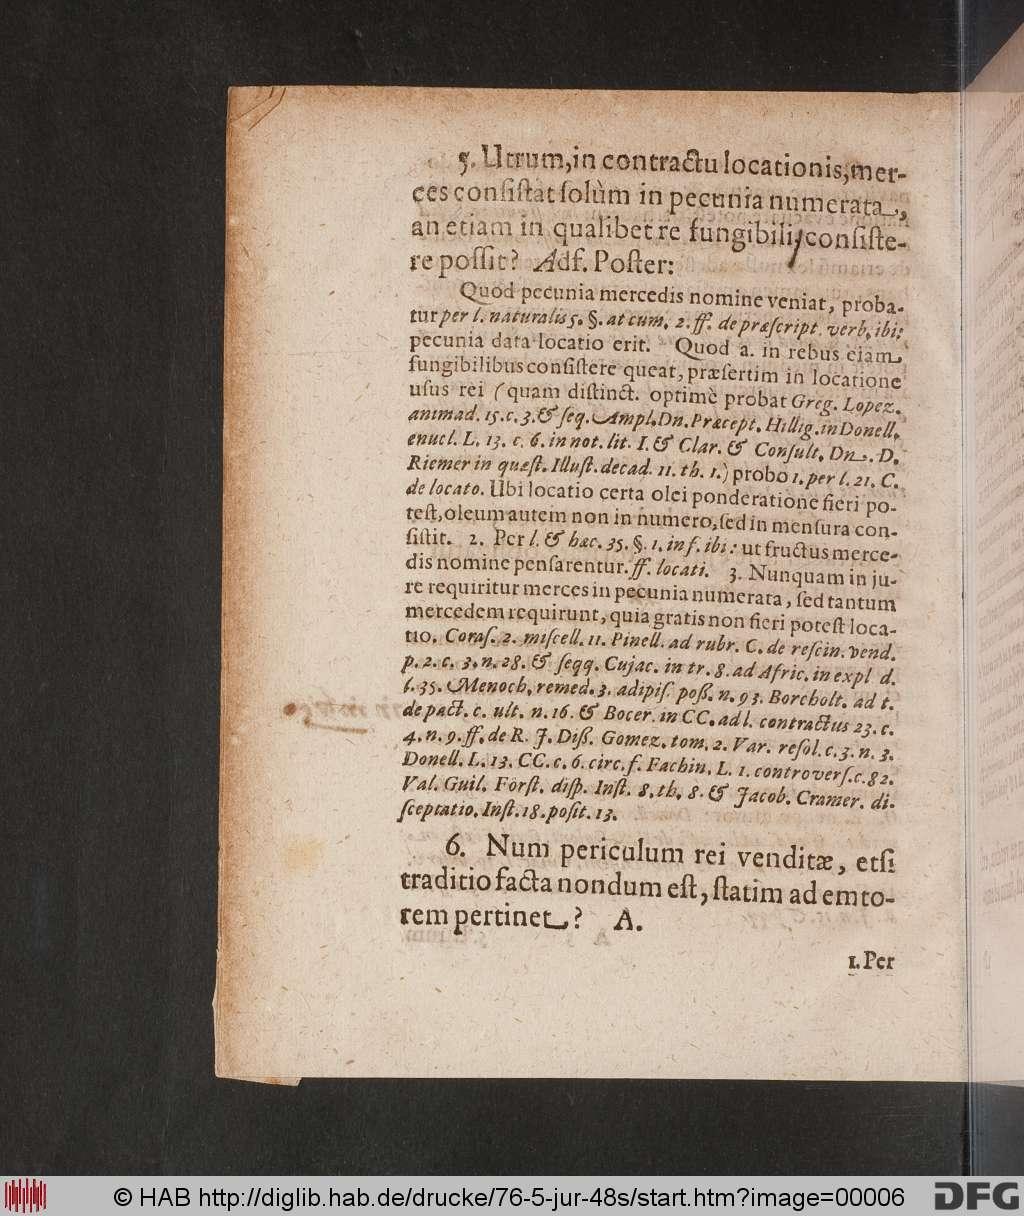 http://diglib.hab.de/drucke/76-5-jur-48s/00006.jpg